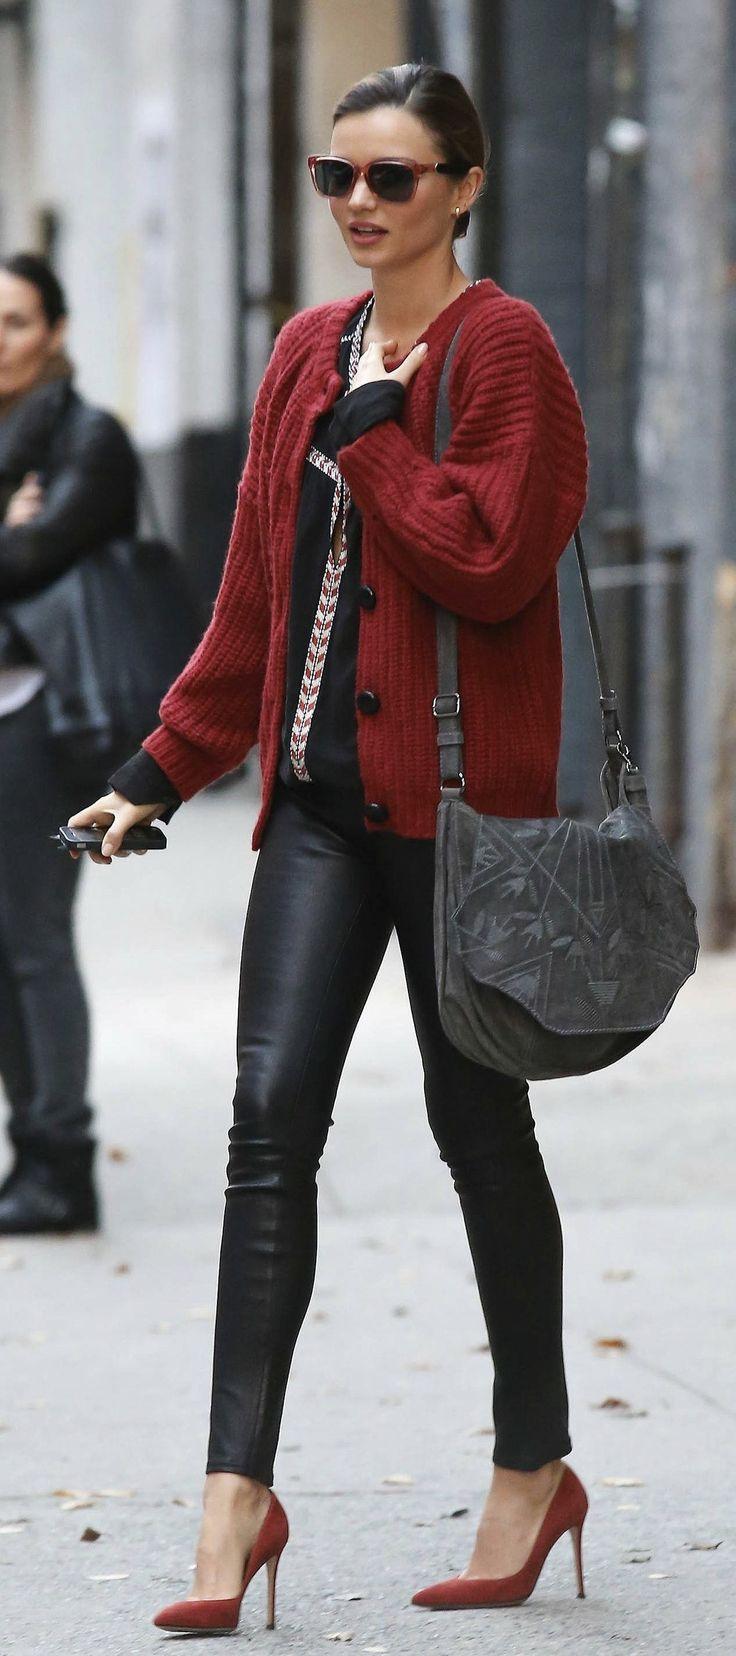 black-skinny-jeans-black-top-blouse-peasant-howtowear-fall-winter-red-cardiganl-leather-red-shoe-pumps-gray-bag-sun-bun-mirandakerr-celebrity-model-hairr-classic-dinner.jpg